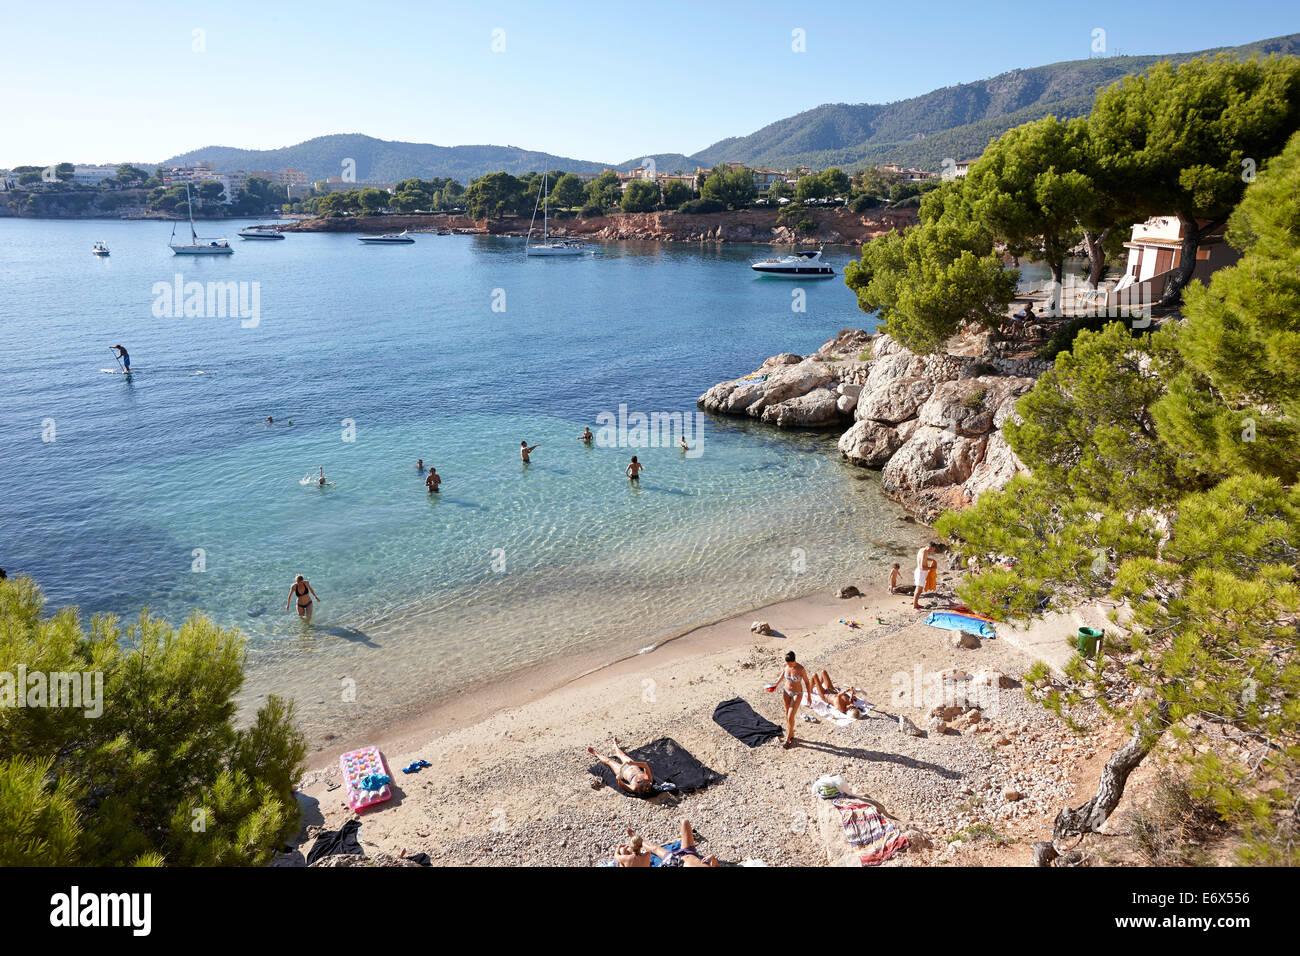 Beach west of Punta Negra H10 Hotel, near Portals Nous, west of Palma, Mallorca, Balearic Islands, Spain - Stock Image